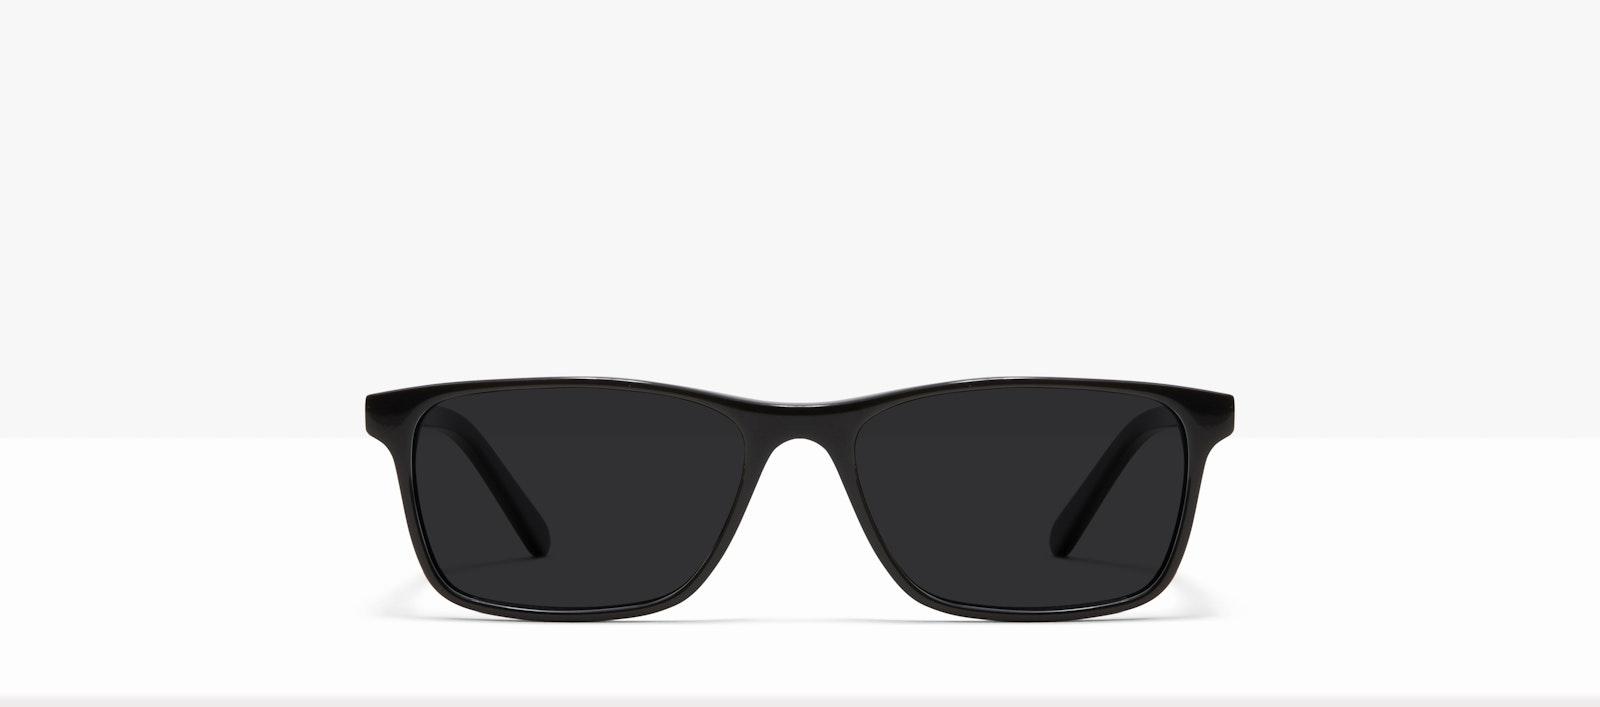 Affordable Fashion Glasses Rectangle Sunglasses Men Henri XL Black Front